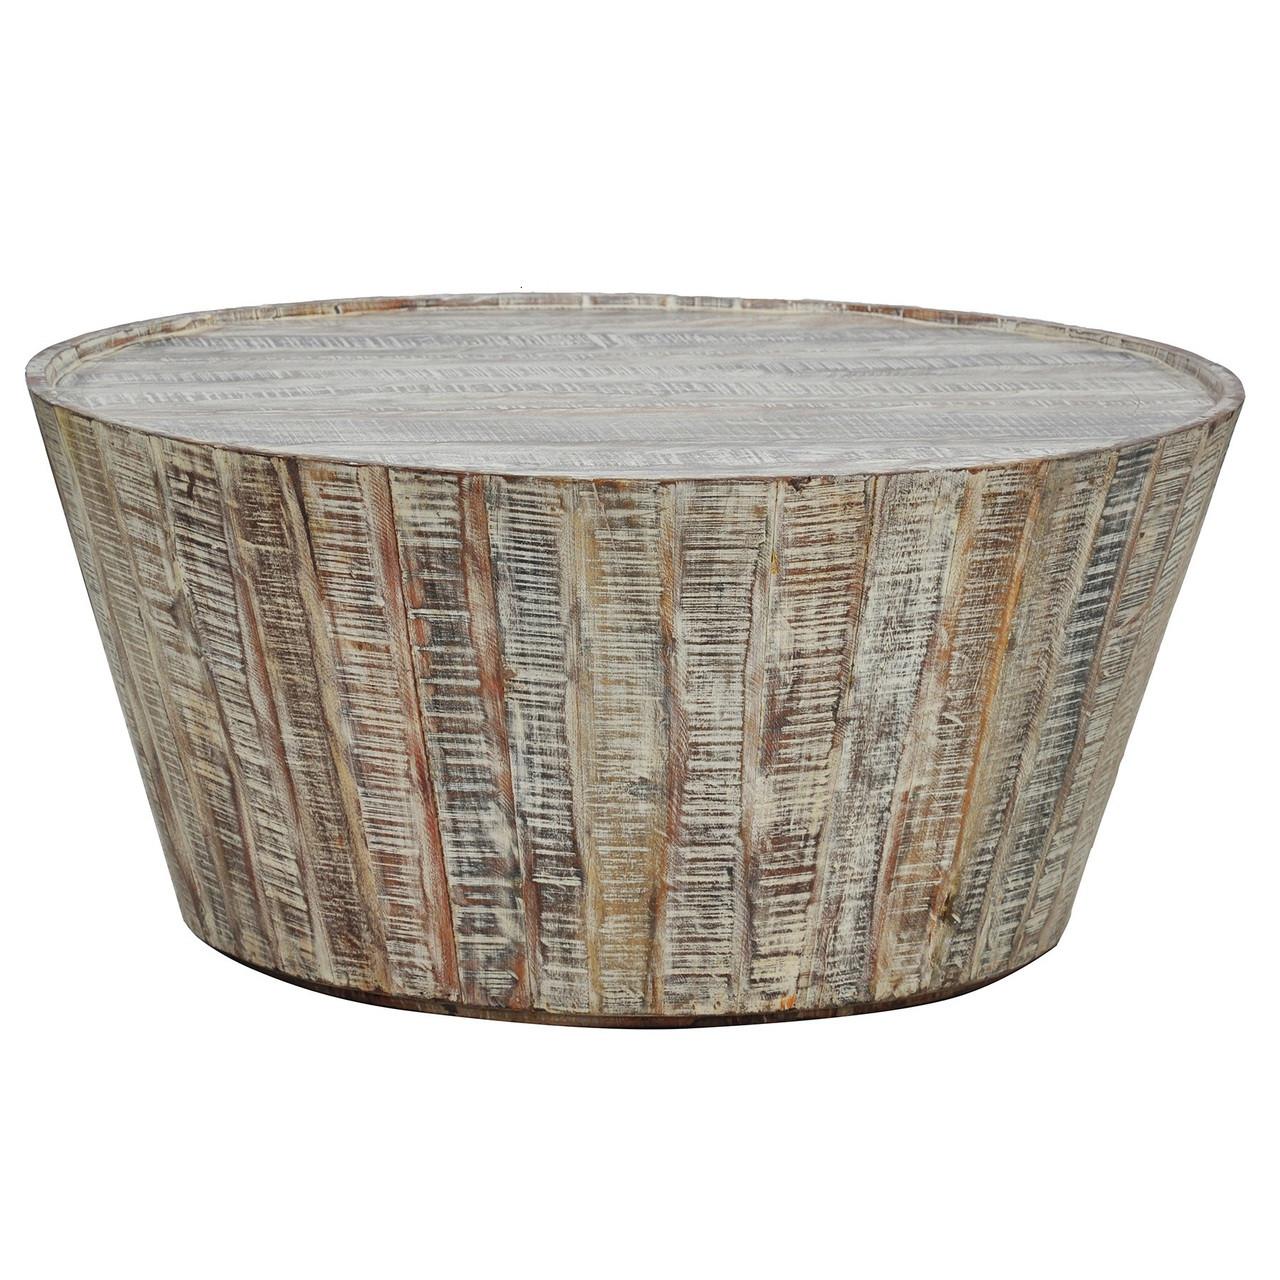 Hampton Rustic Wood Round Barrel Coffee Table 38